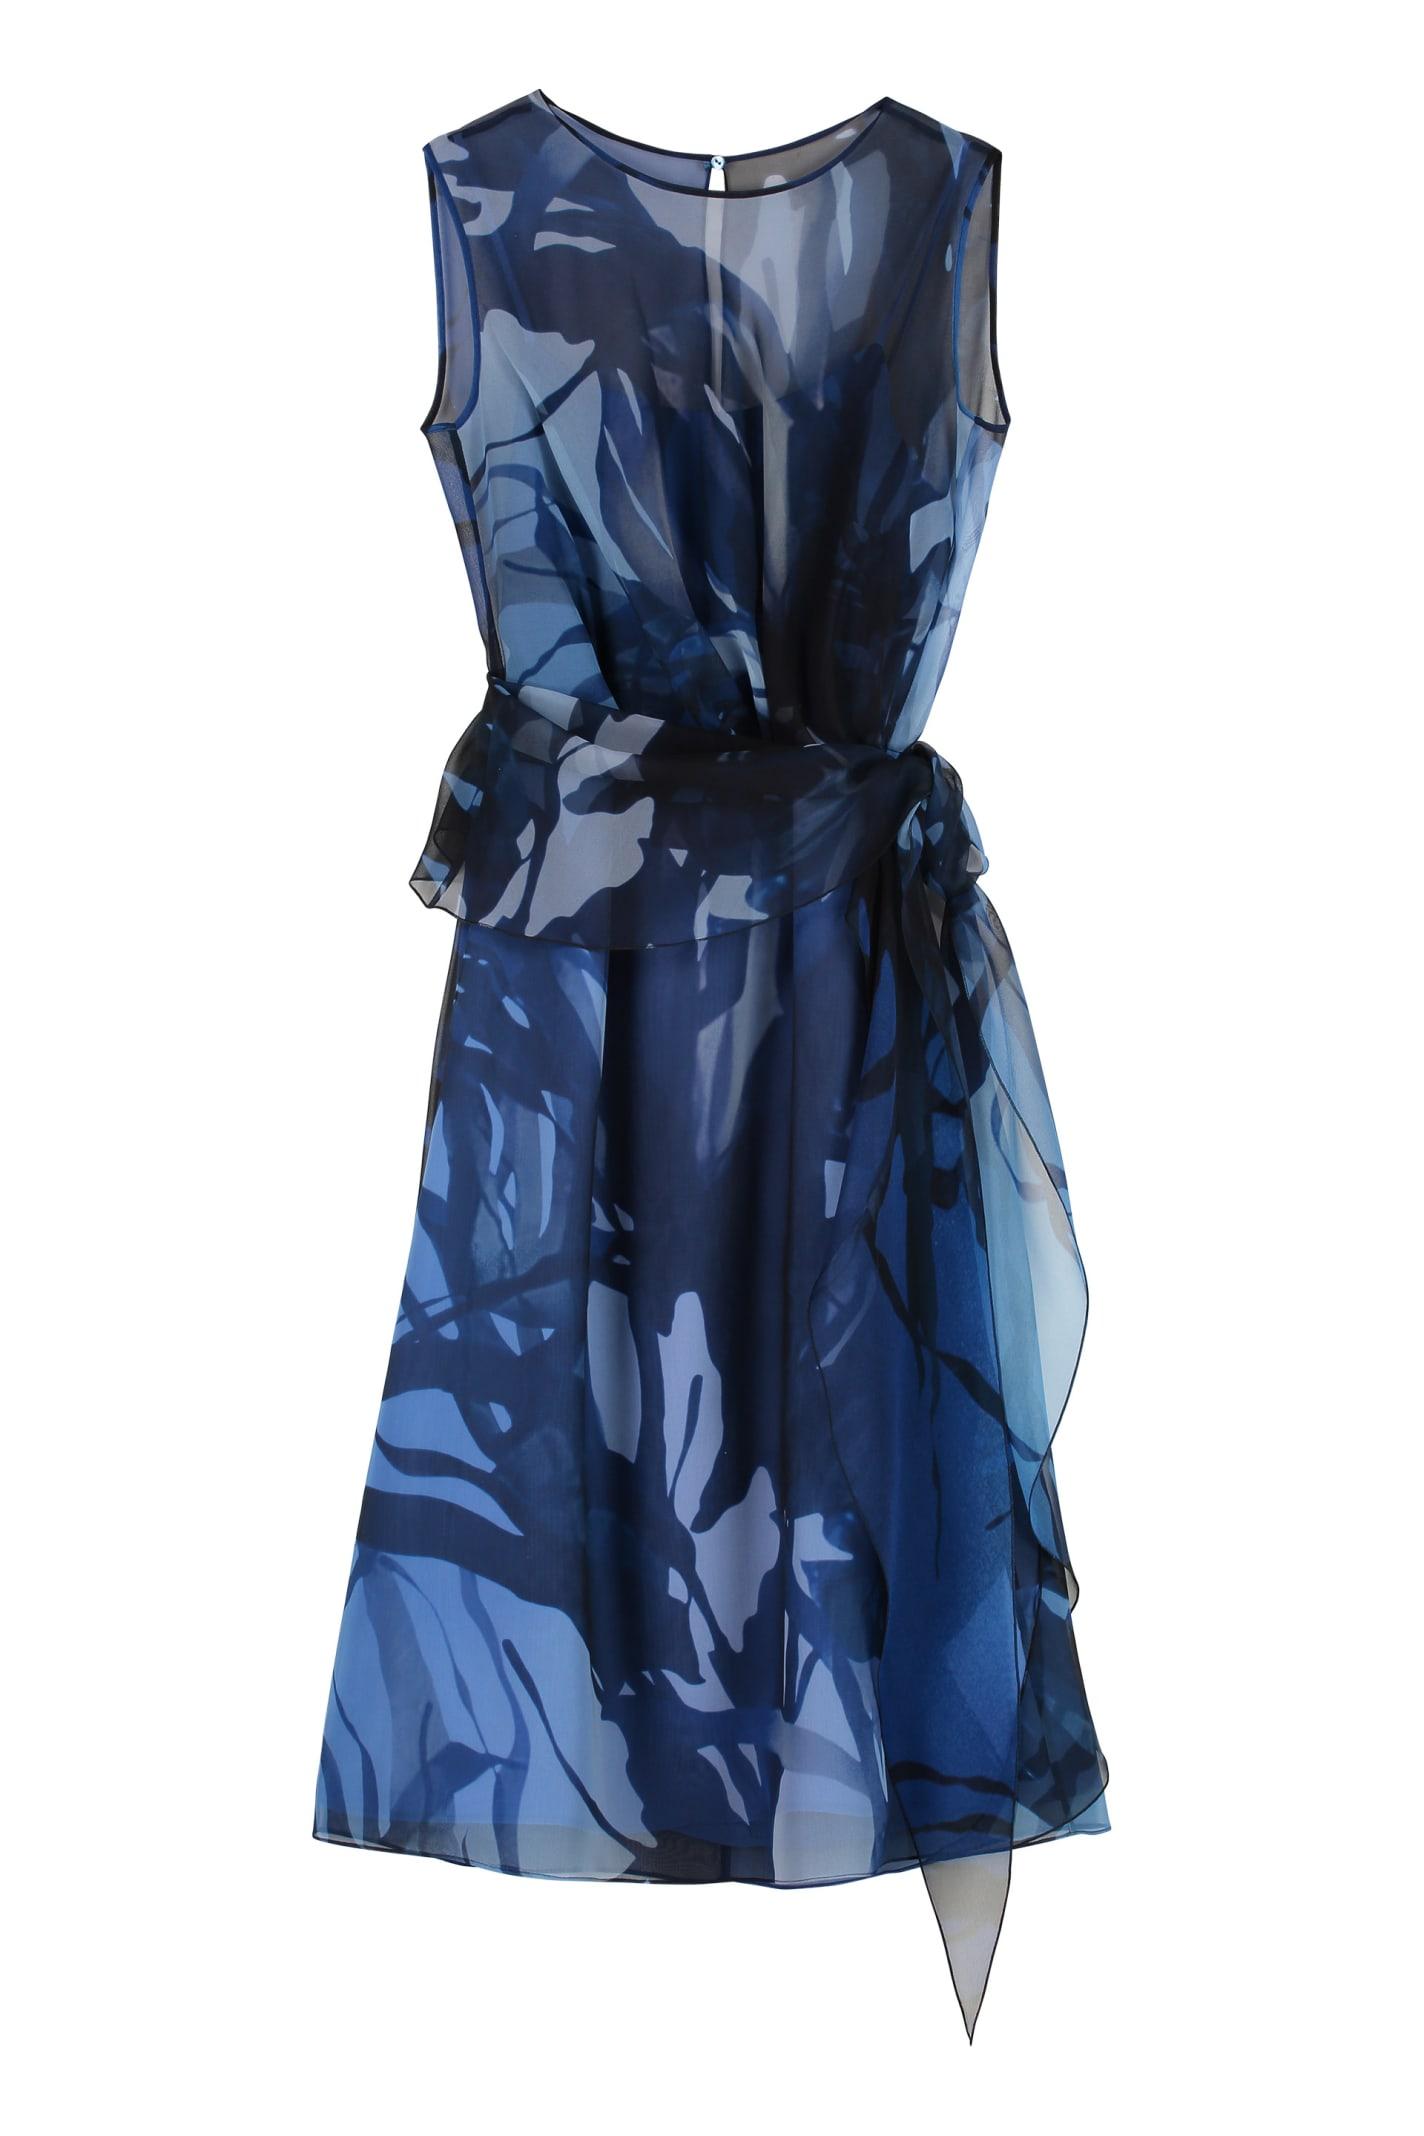 Max Mara Zolfo Printed Chiffon Dress